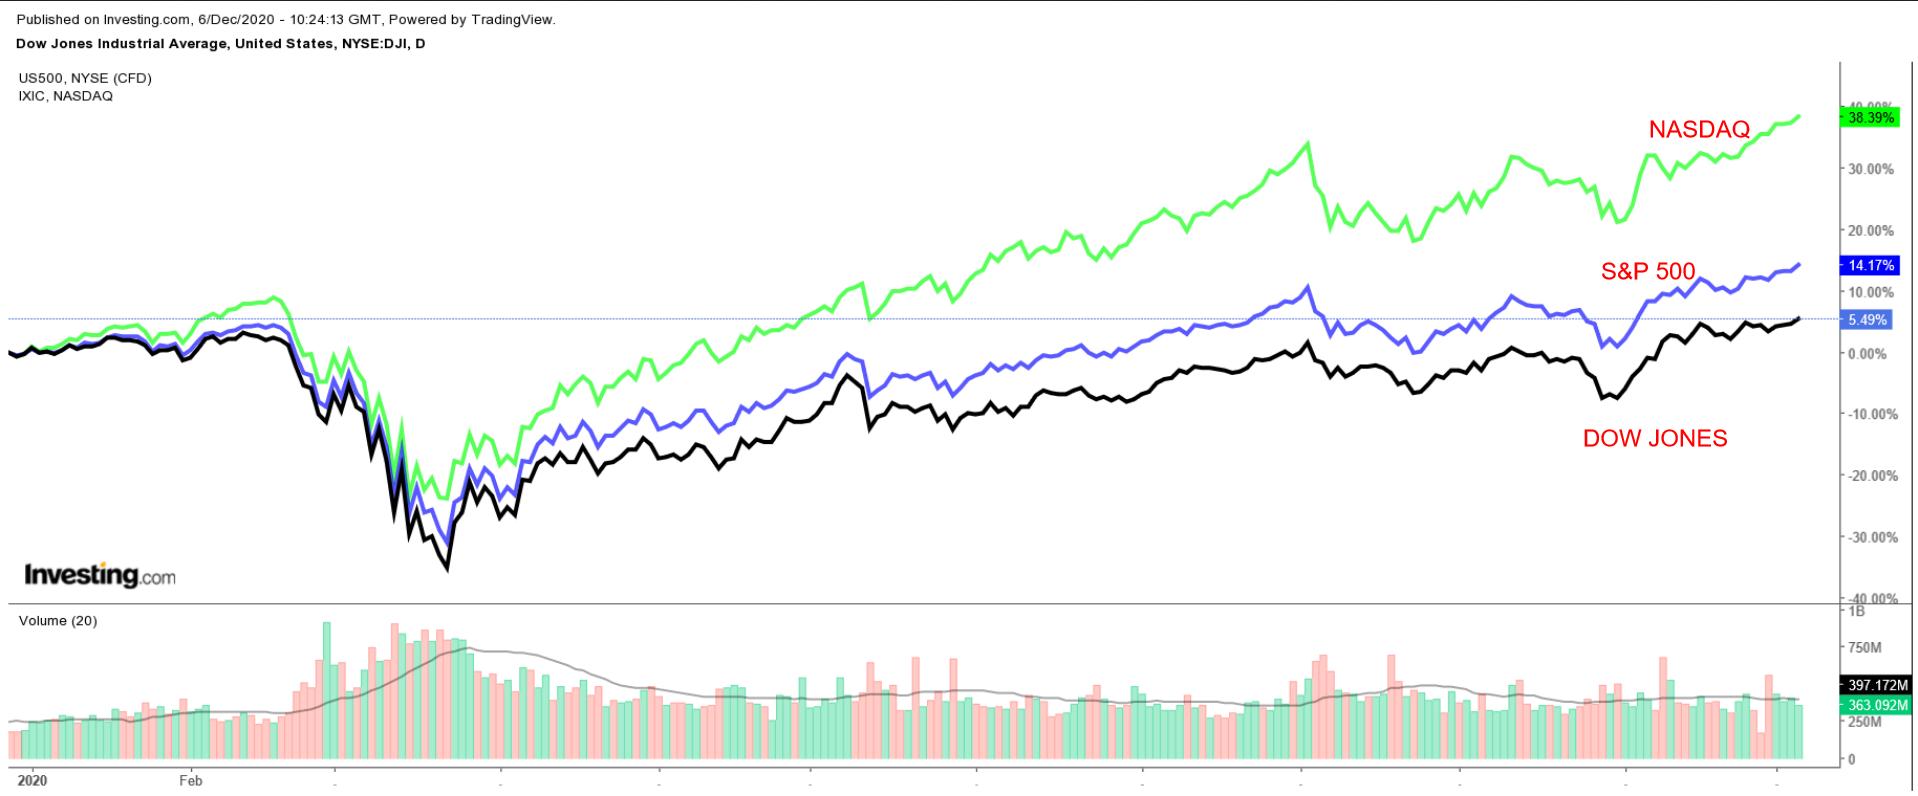 Dow Jones, S&P 500, NASDAQ Daily Chart